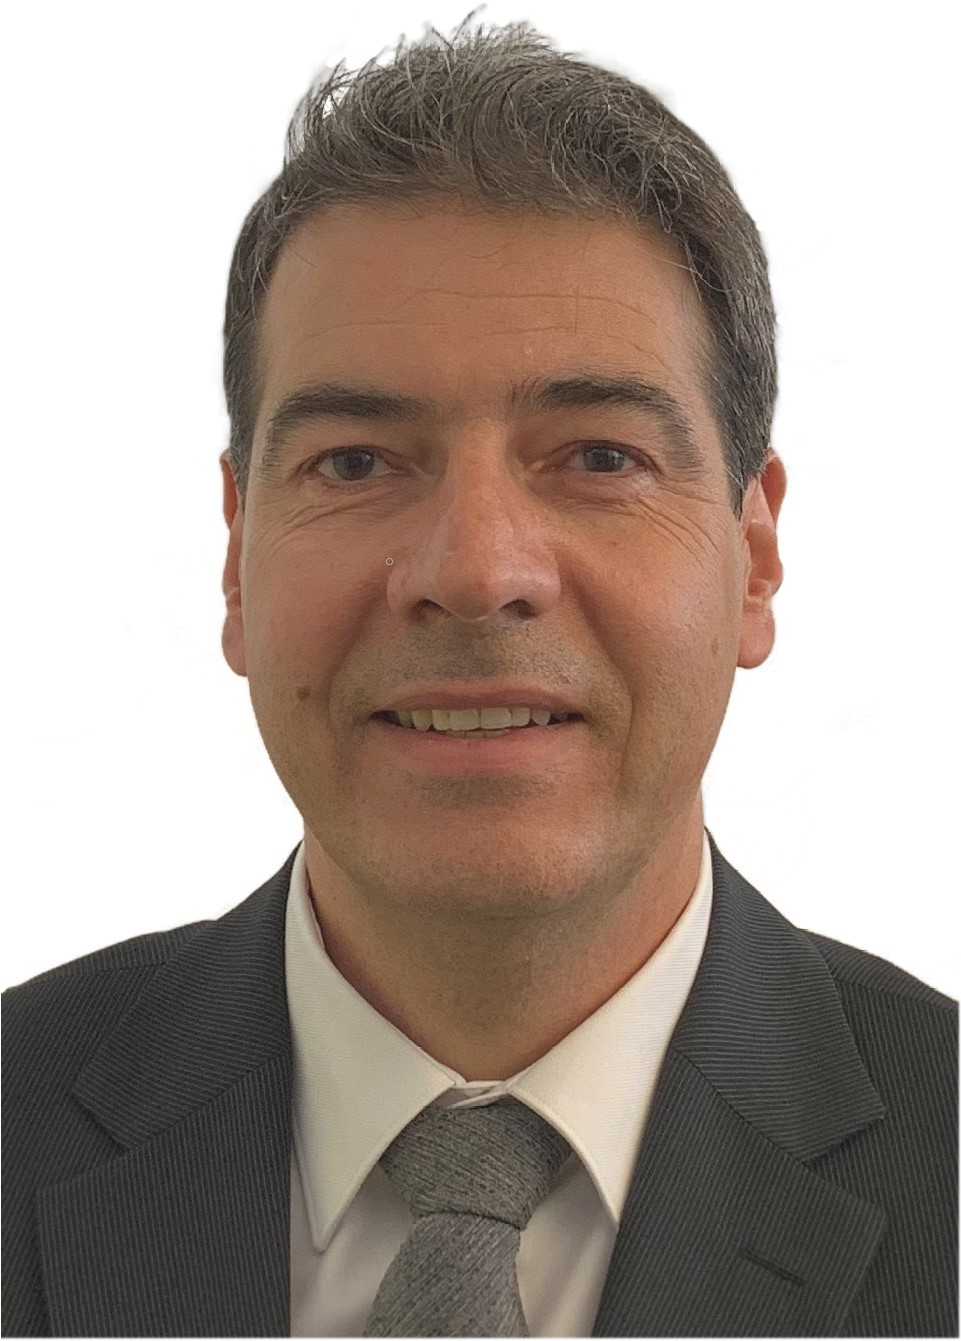 Anastasios Vassilopoulos